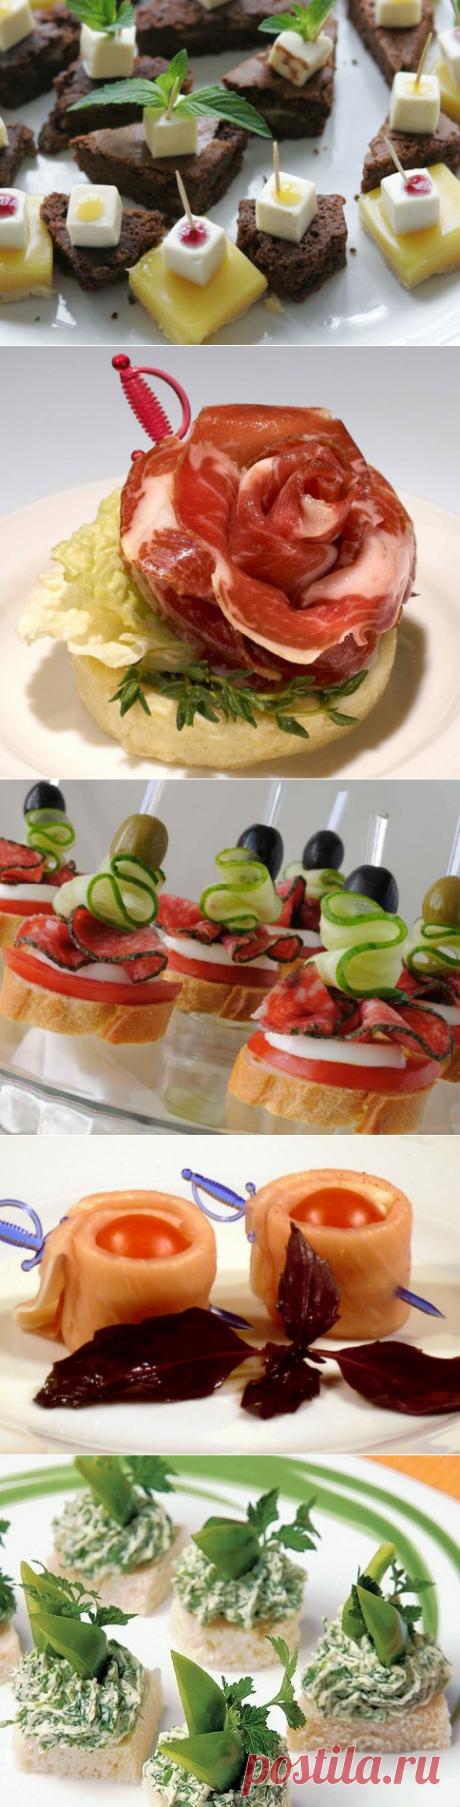 Проверенные салаты .ru - Красивые рецепты канапе